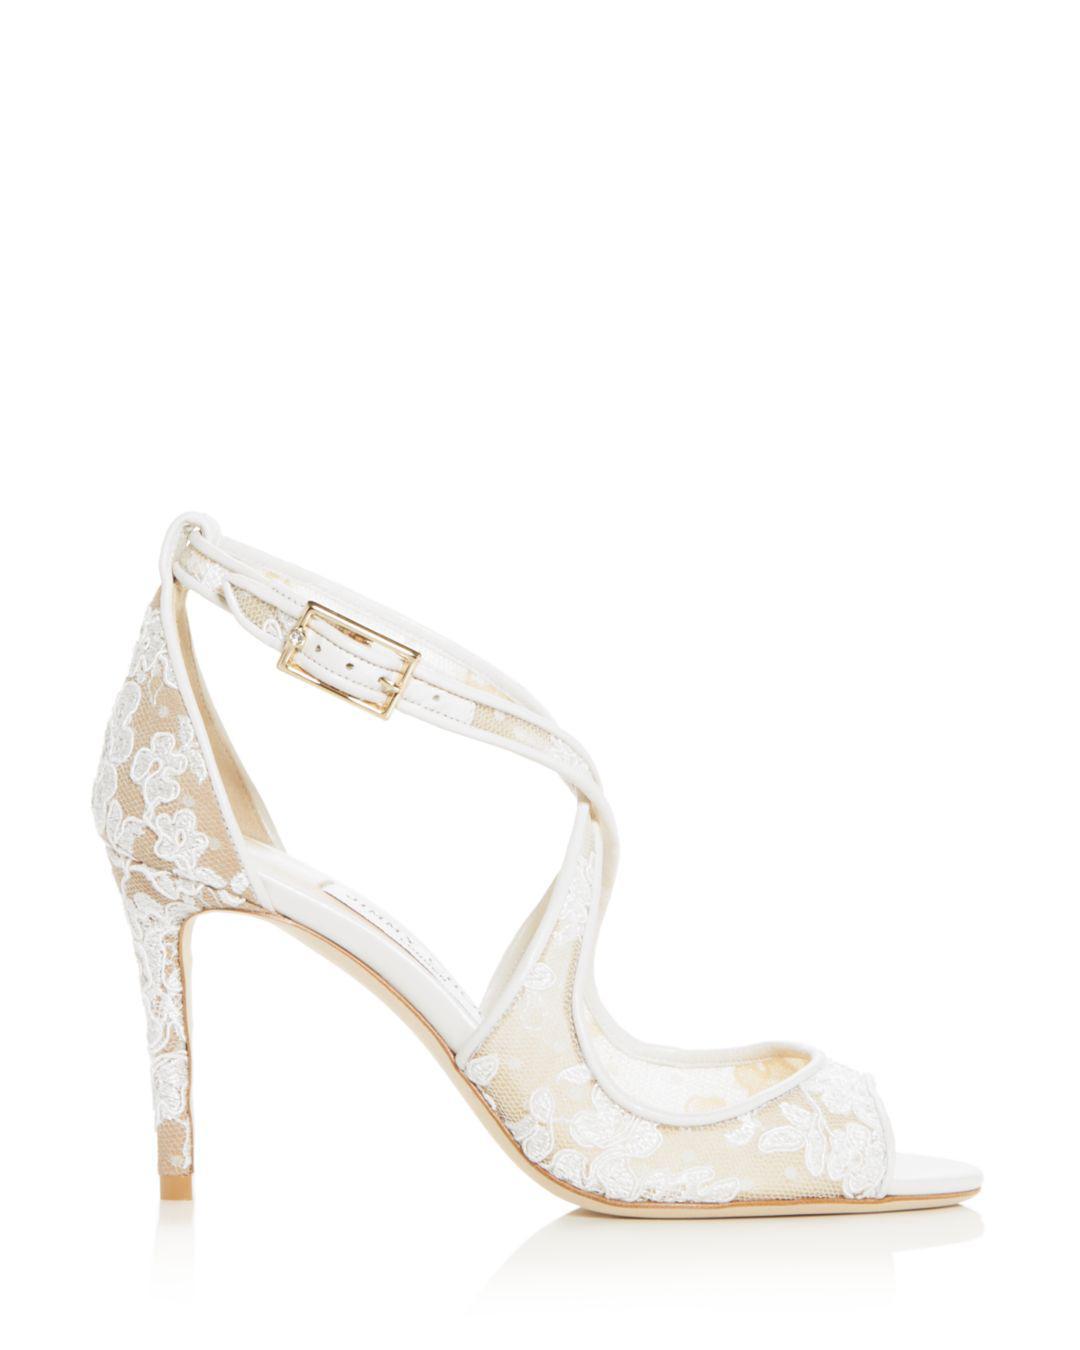 98afe5117894 Lyst - Jimmy Choo Women s Emily 85 Crisscross High-heel Sandals in White